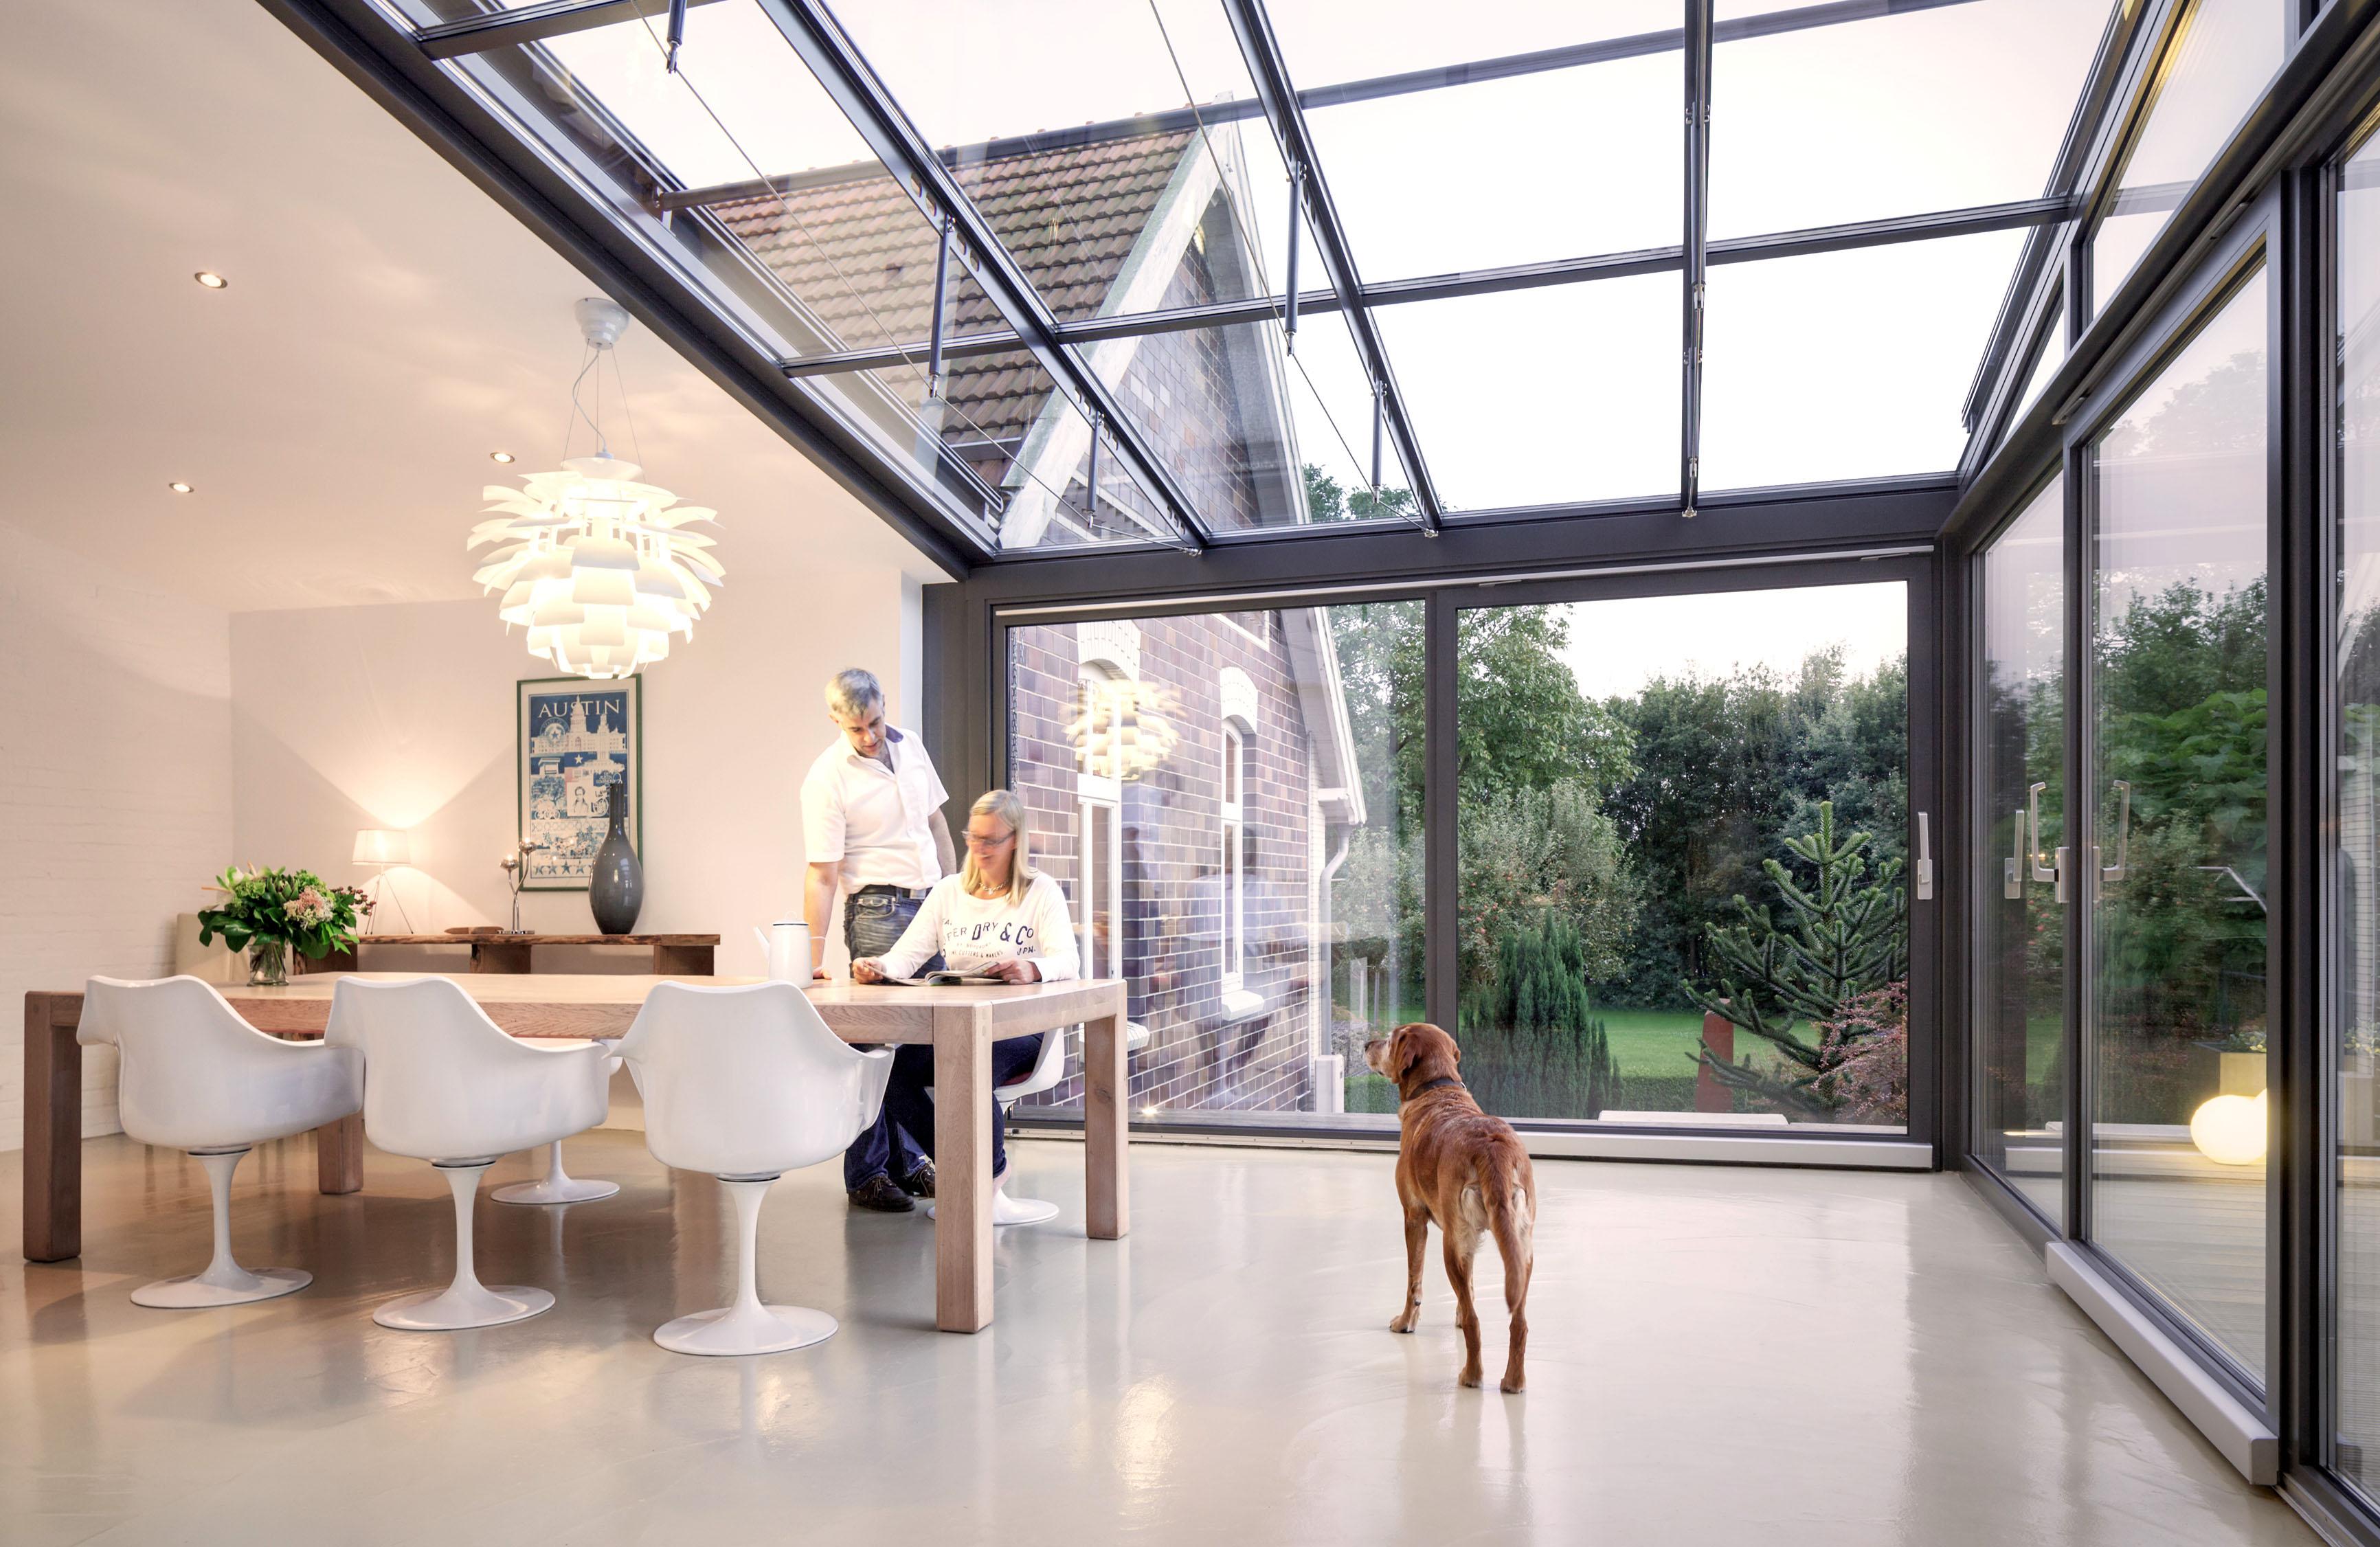 solarlux winterg rten faltt ren schiebet ren raumausstatter daniel m ller heilbad. Black Bedroom Furniture Sets. Home Design Ideas